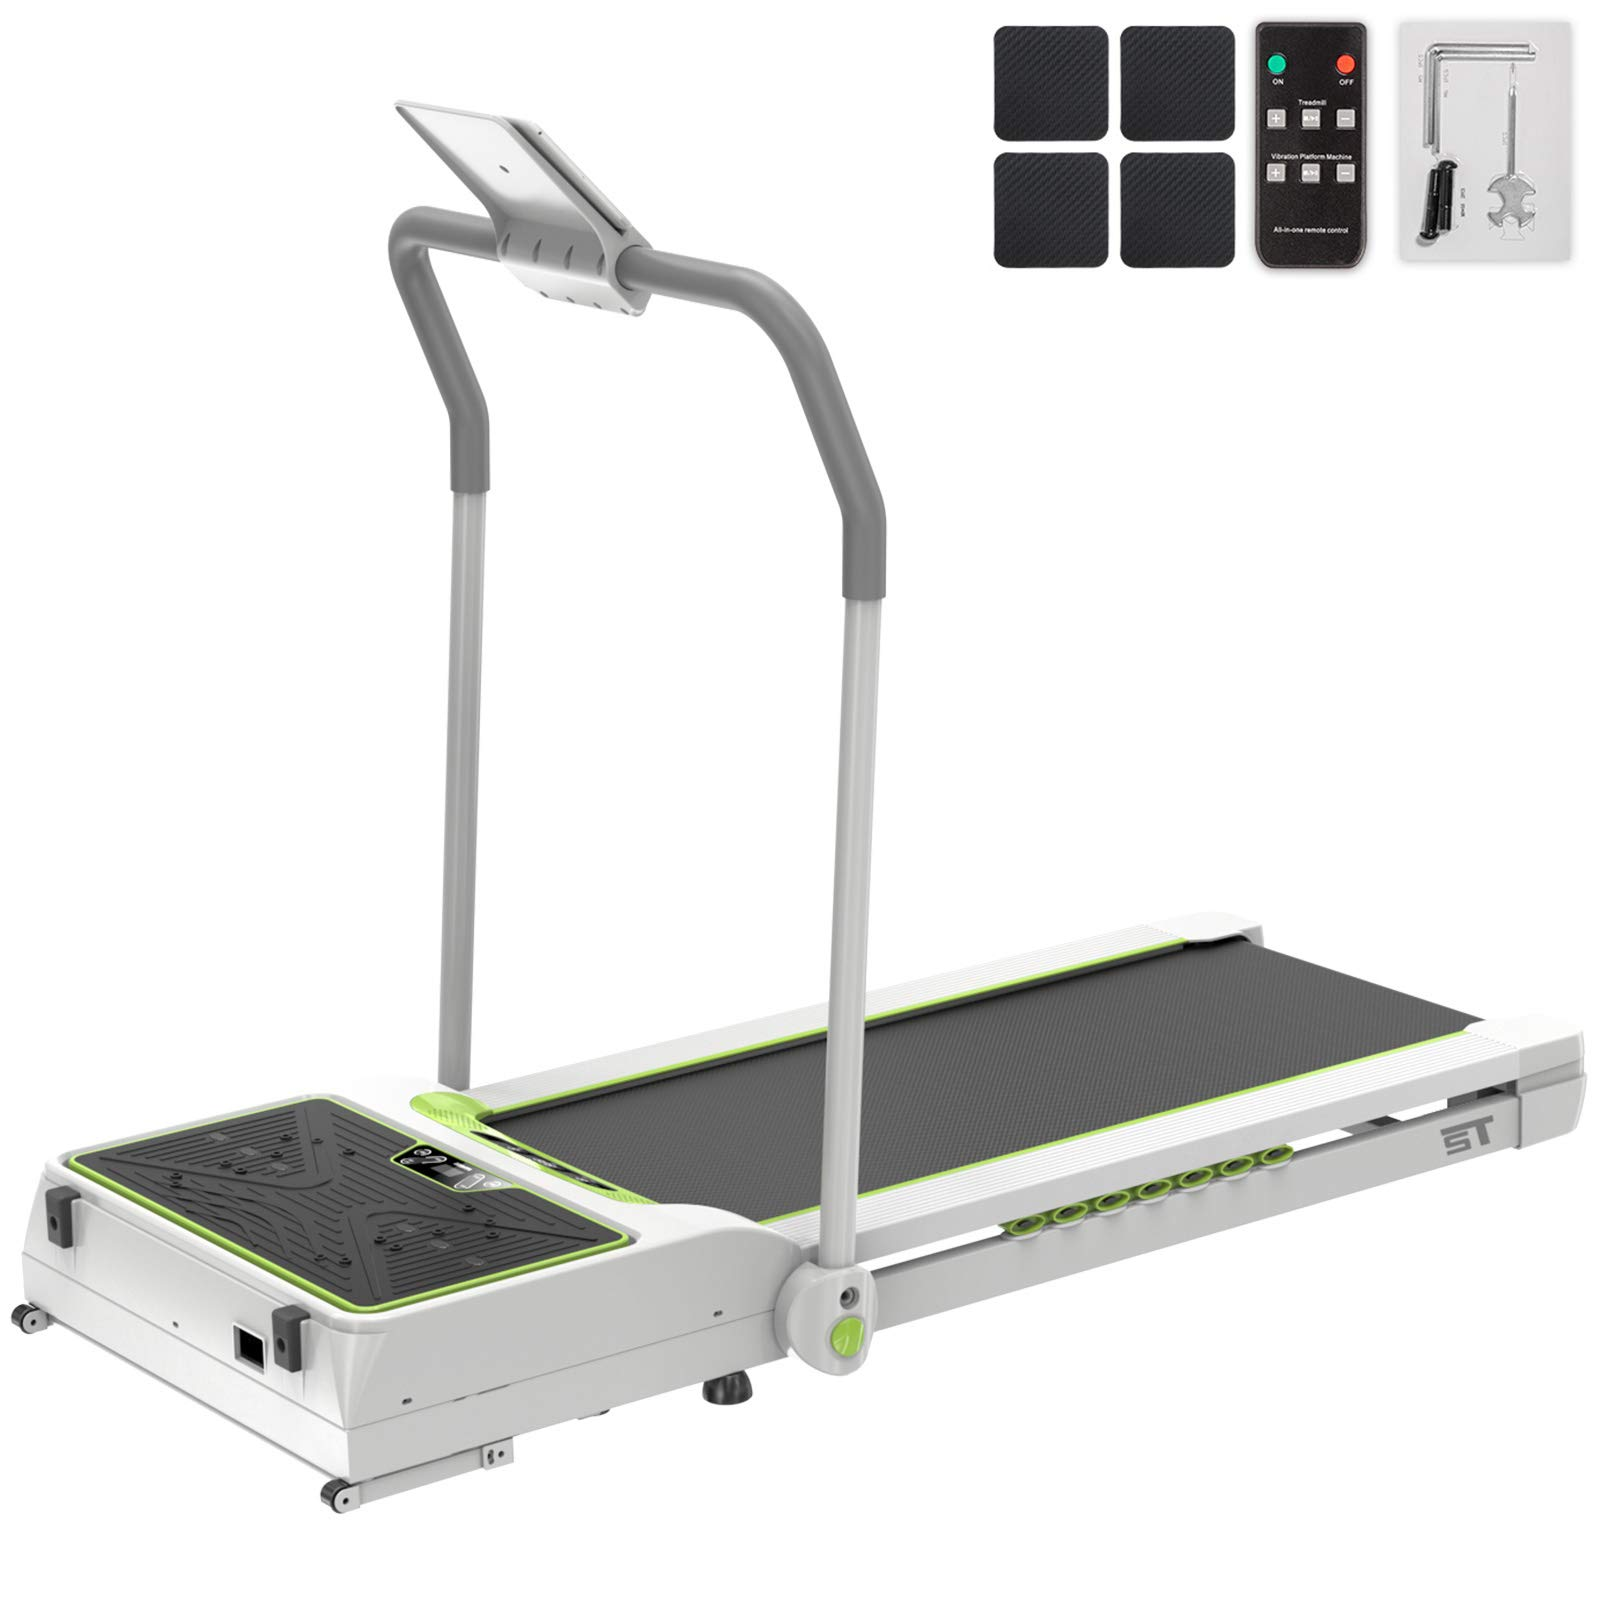 Popsport Smart Treadmill Vibration Platform 3 in 1 Integrate Running Quiet Treadly Treadmill Vibration Plate Folding Digital Portable Under Desk Treadmill Fitness for Home Office(Green with Handle) by Popsport